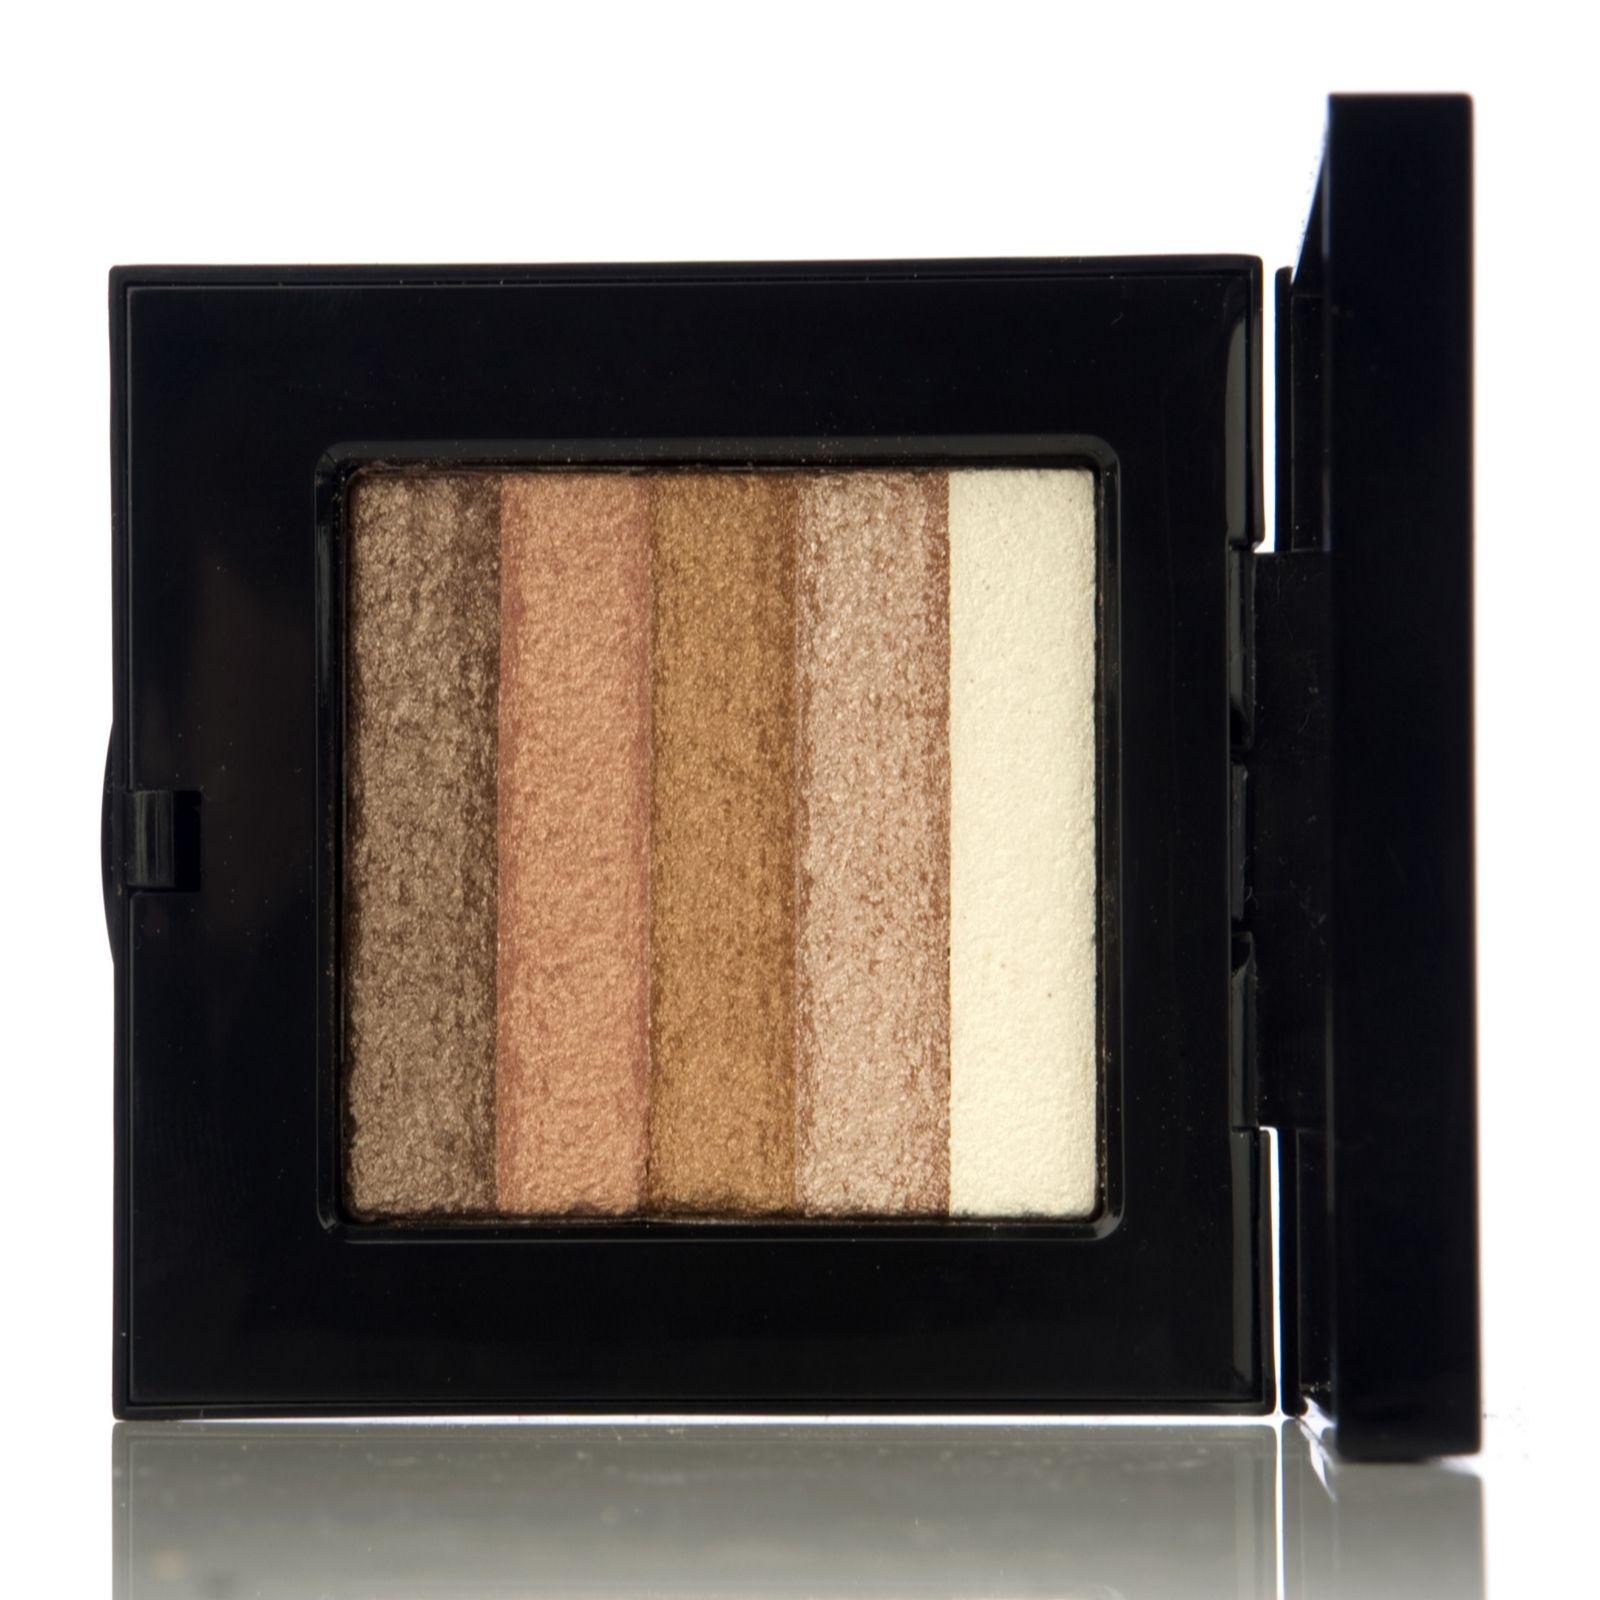 812e7a2f22b5 Bobbi Brown Shimmer Brick Compact - Page 1 - QVC UK